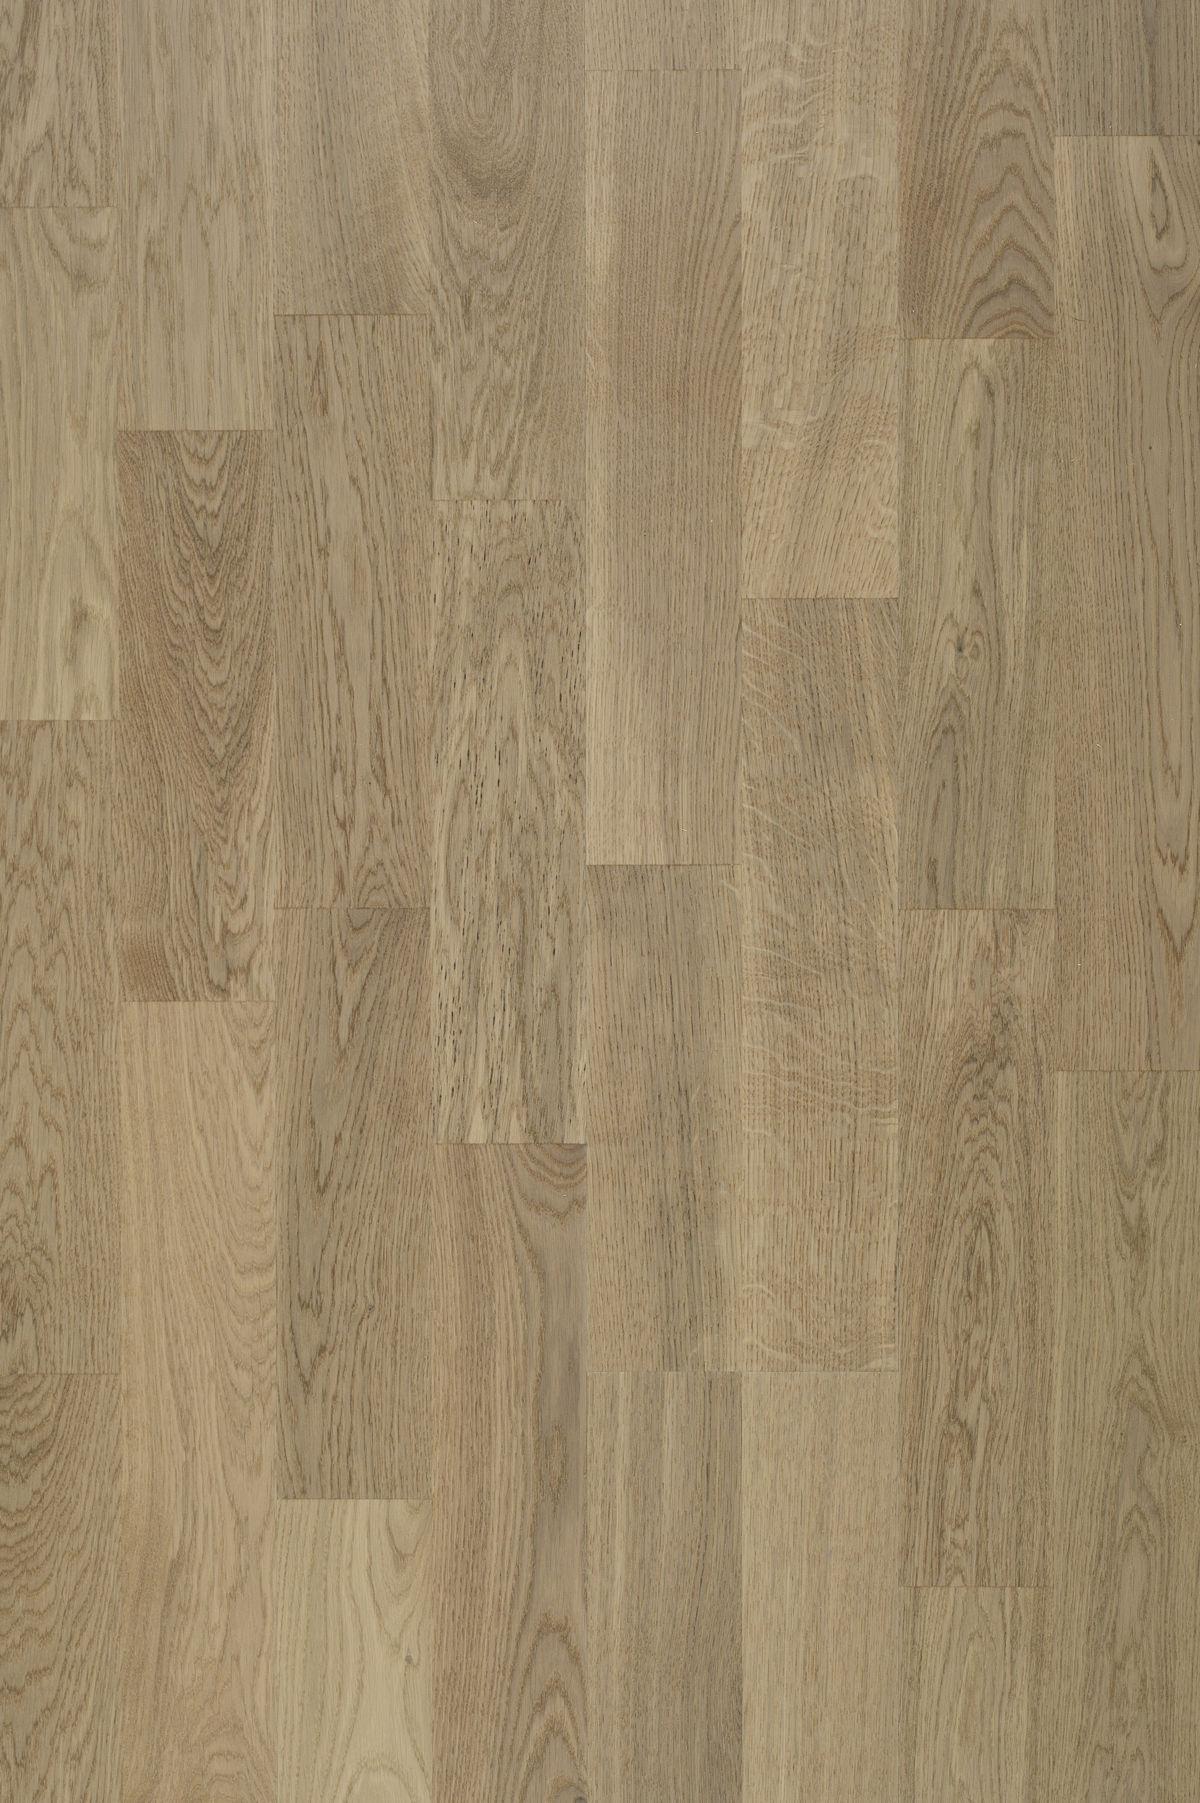 Kahrs oak portofino engineered wood flooring for Kahrs hardwood flooring